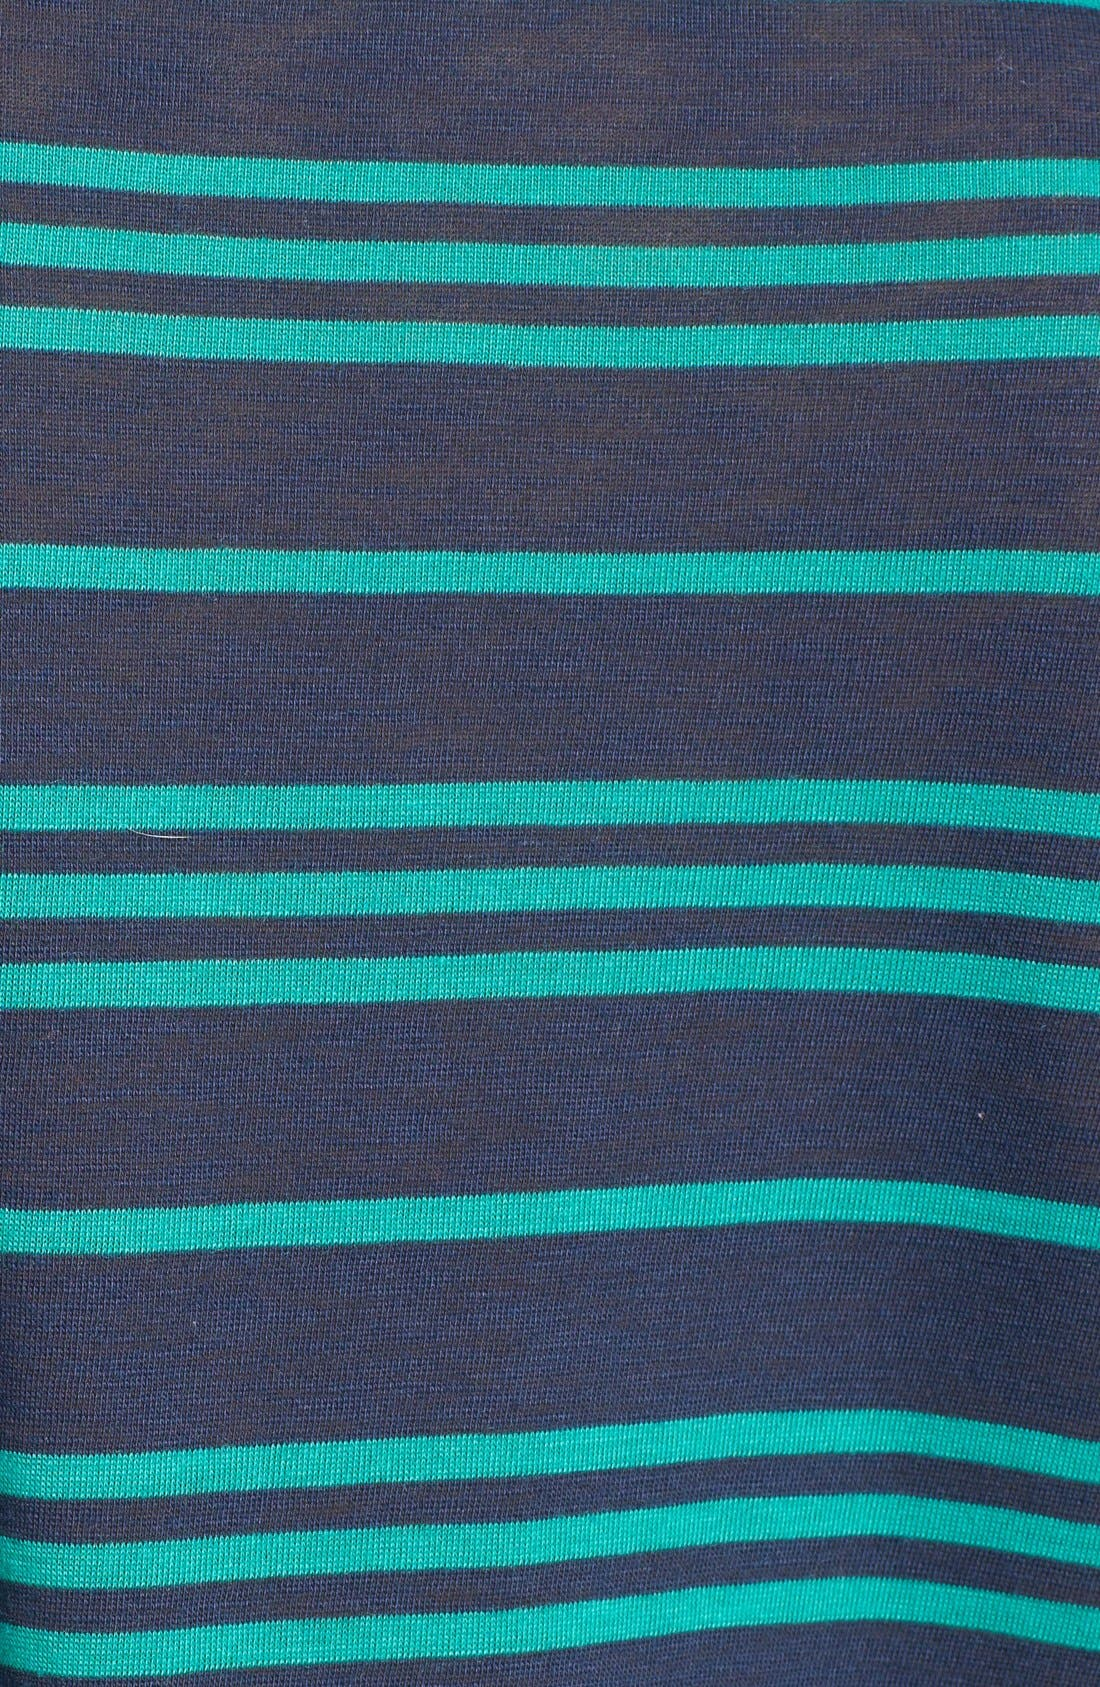 Alternate Image 3  - Splendid 'Stockholm' Stripe Jersey Tee